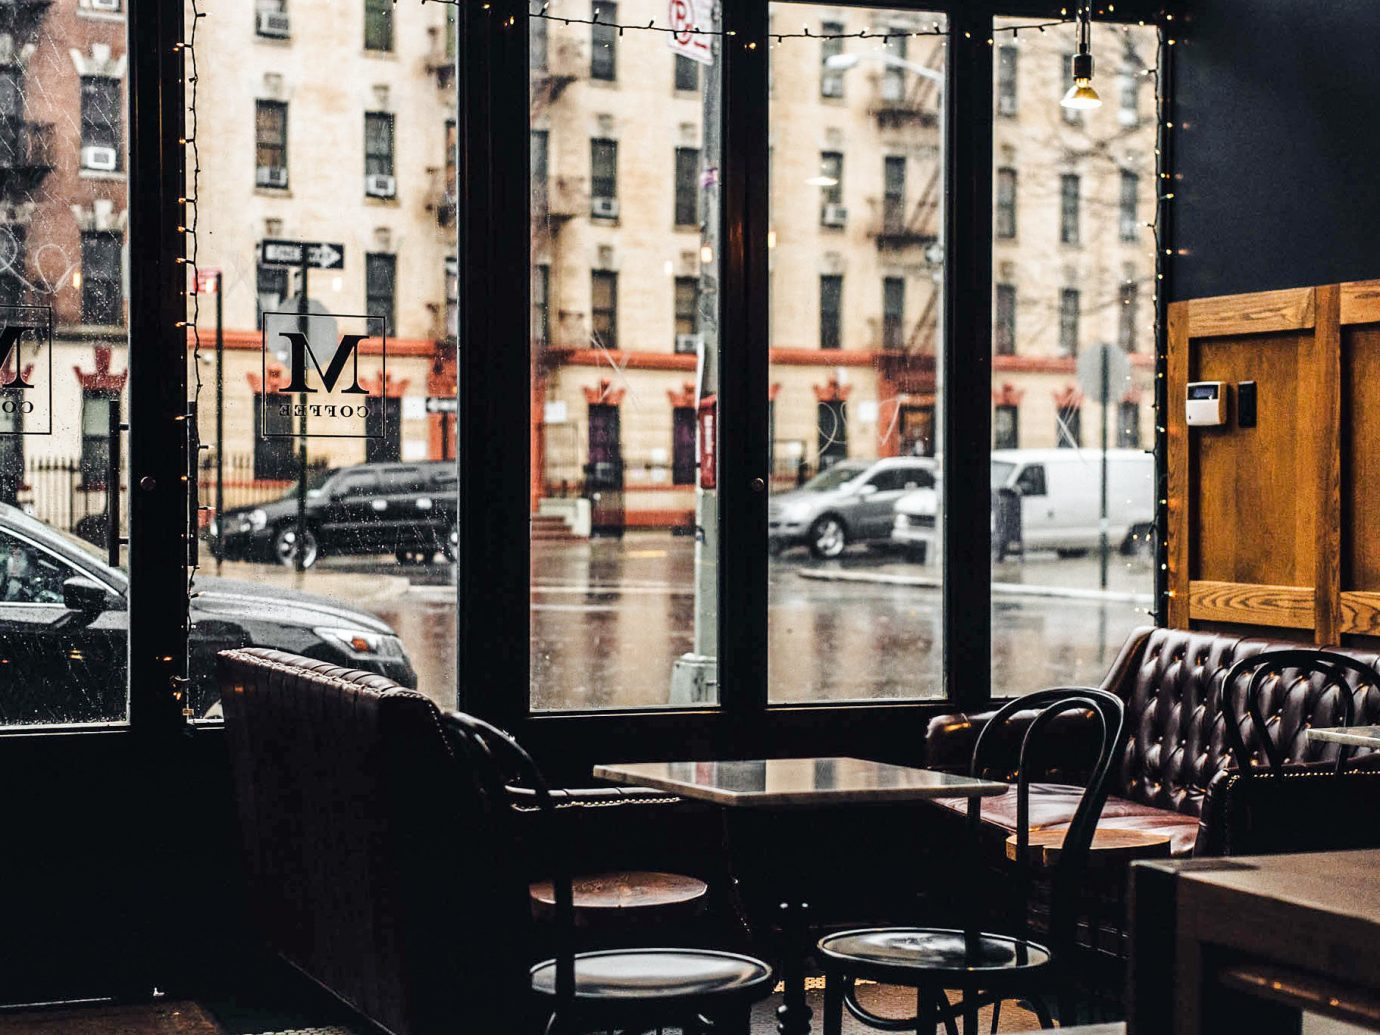 Brooklyn Food + Drink NYC building outdoor urban area window City street car reflection